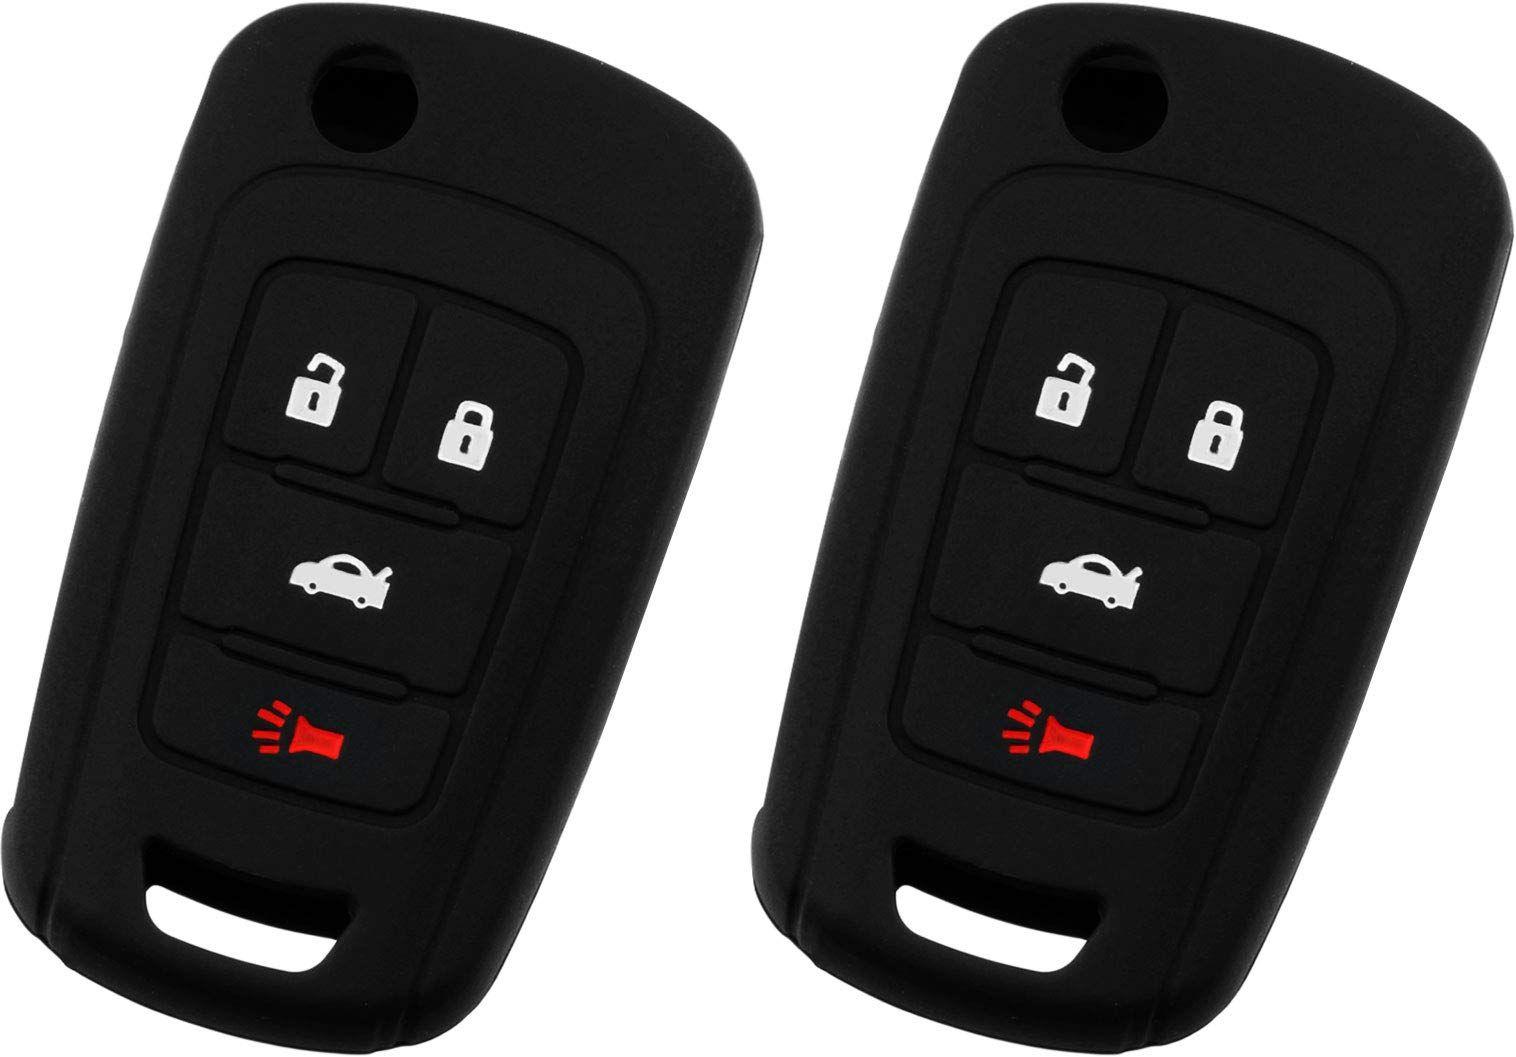 Keyguardz Keyless Entry Remote Car Key Fob Outer Shell Cover Soft